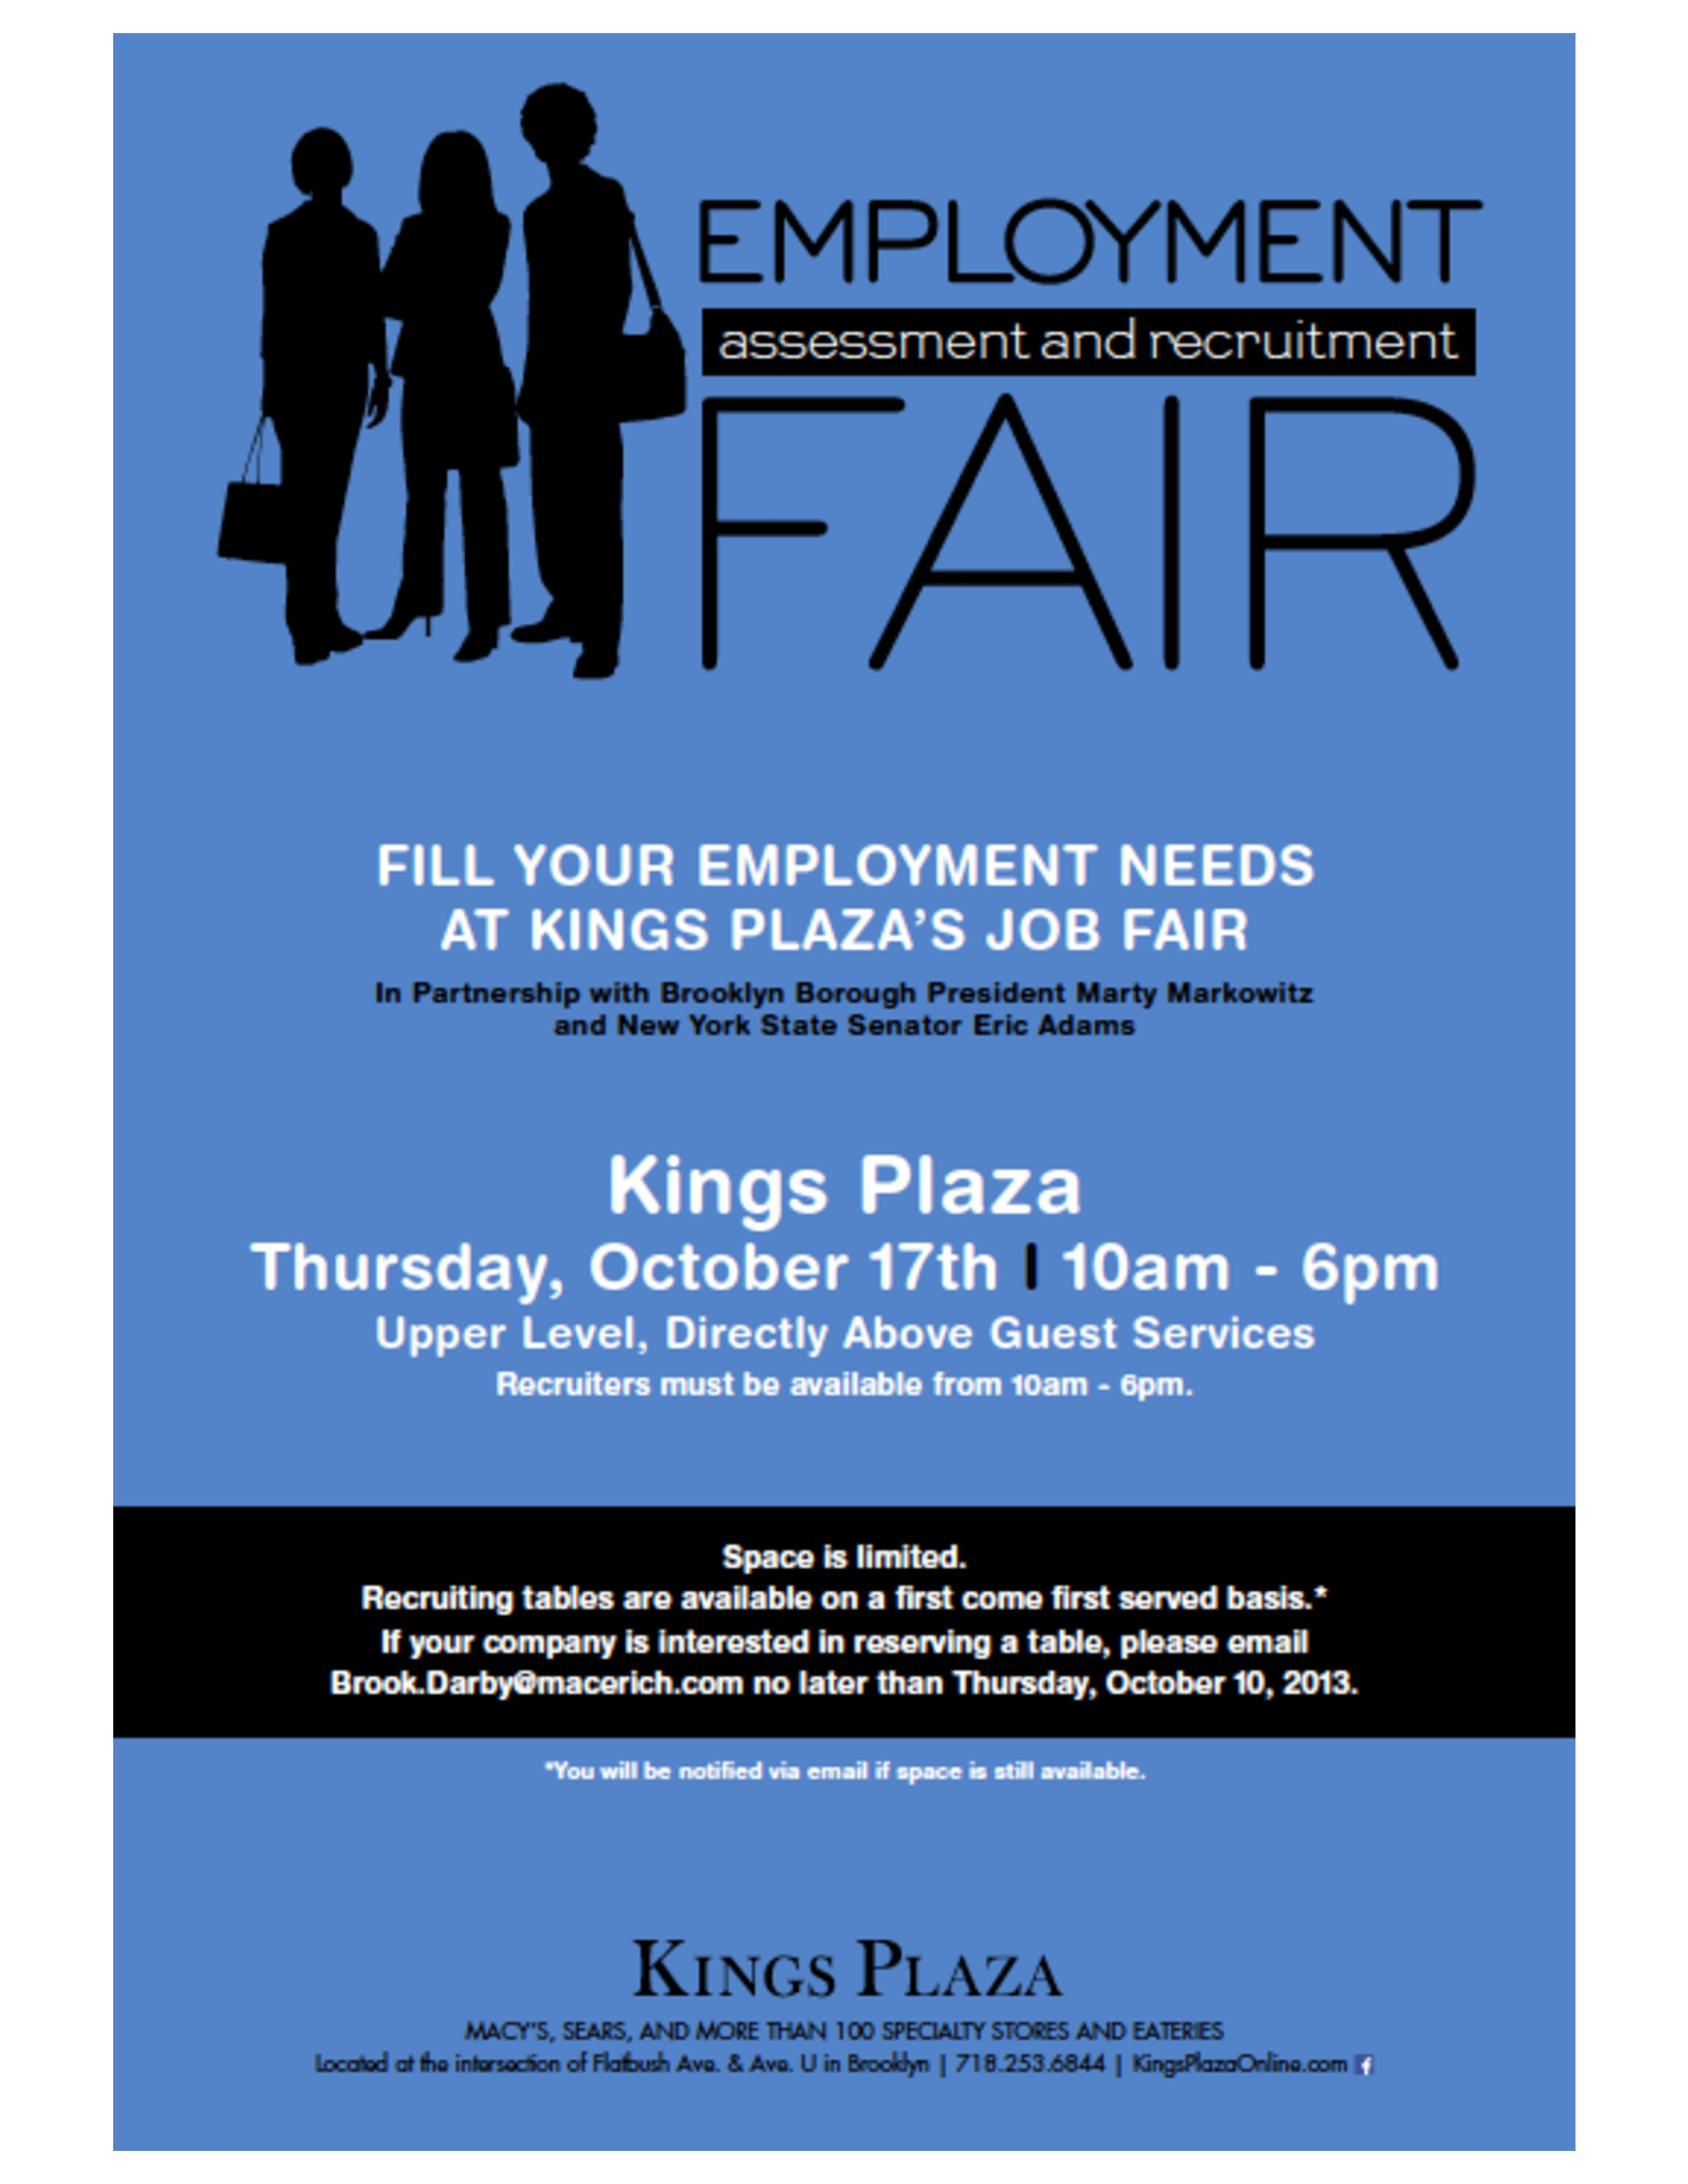 job fair at kings plaza thursday october 17 2013 ny state senate